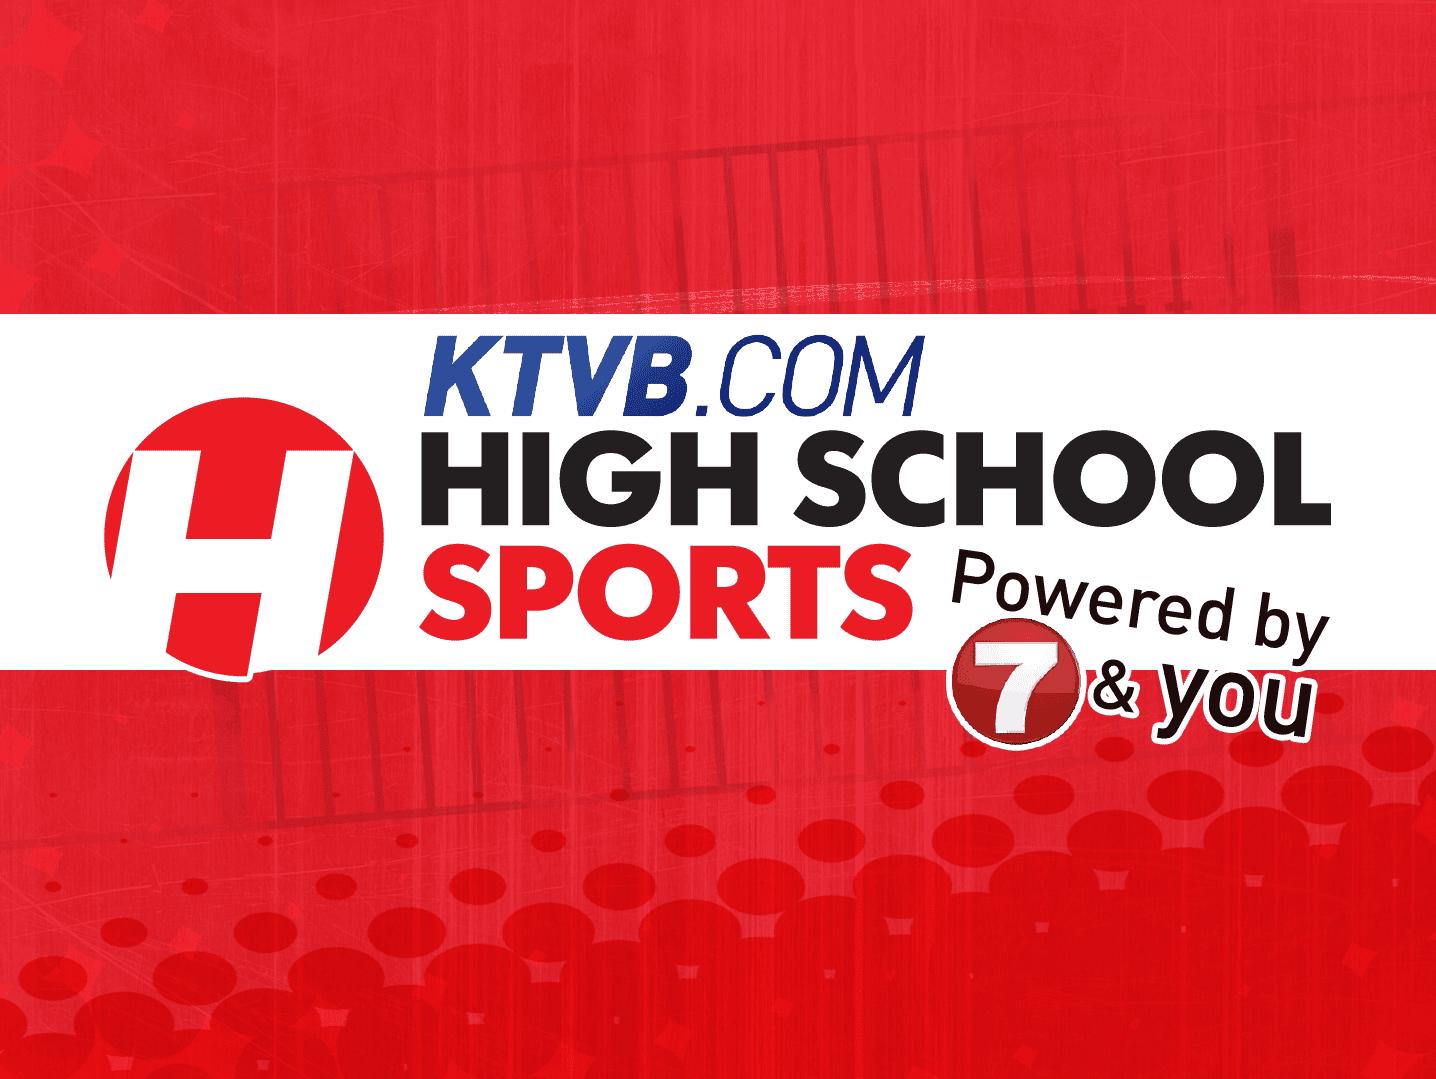 KTVB High School Sports